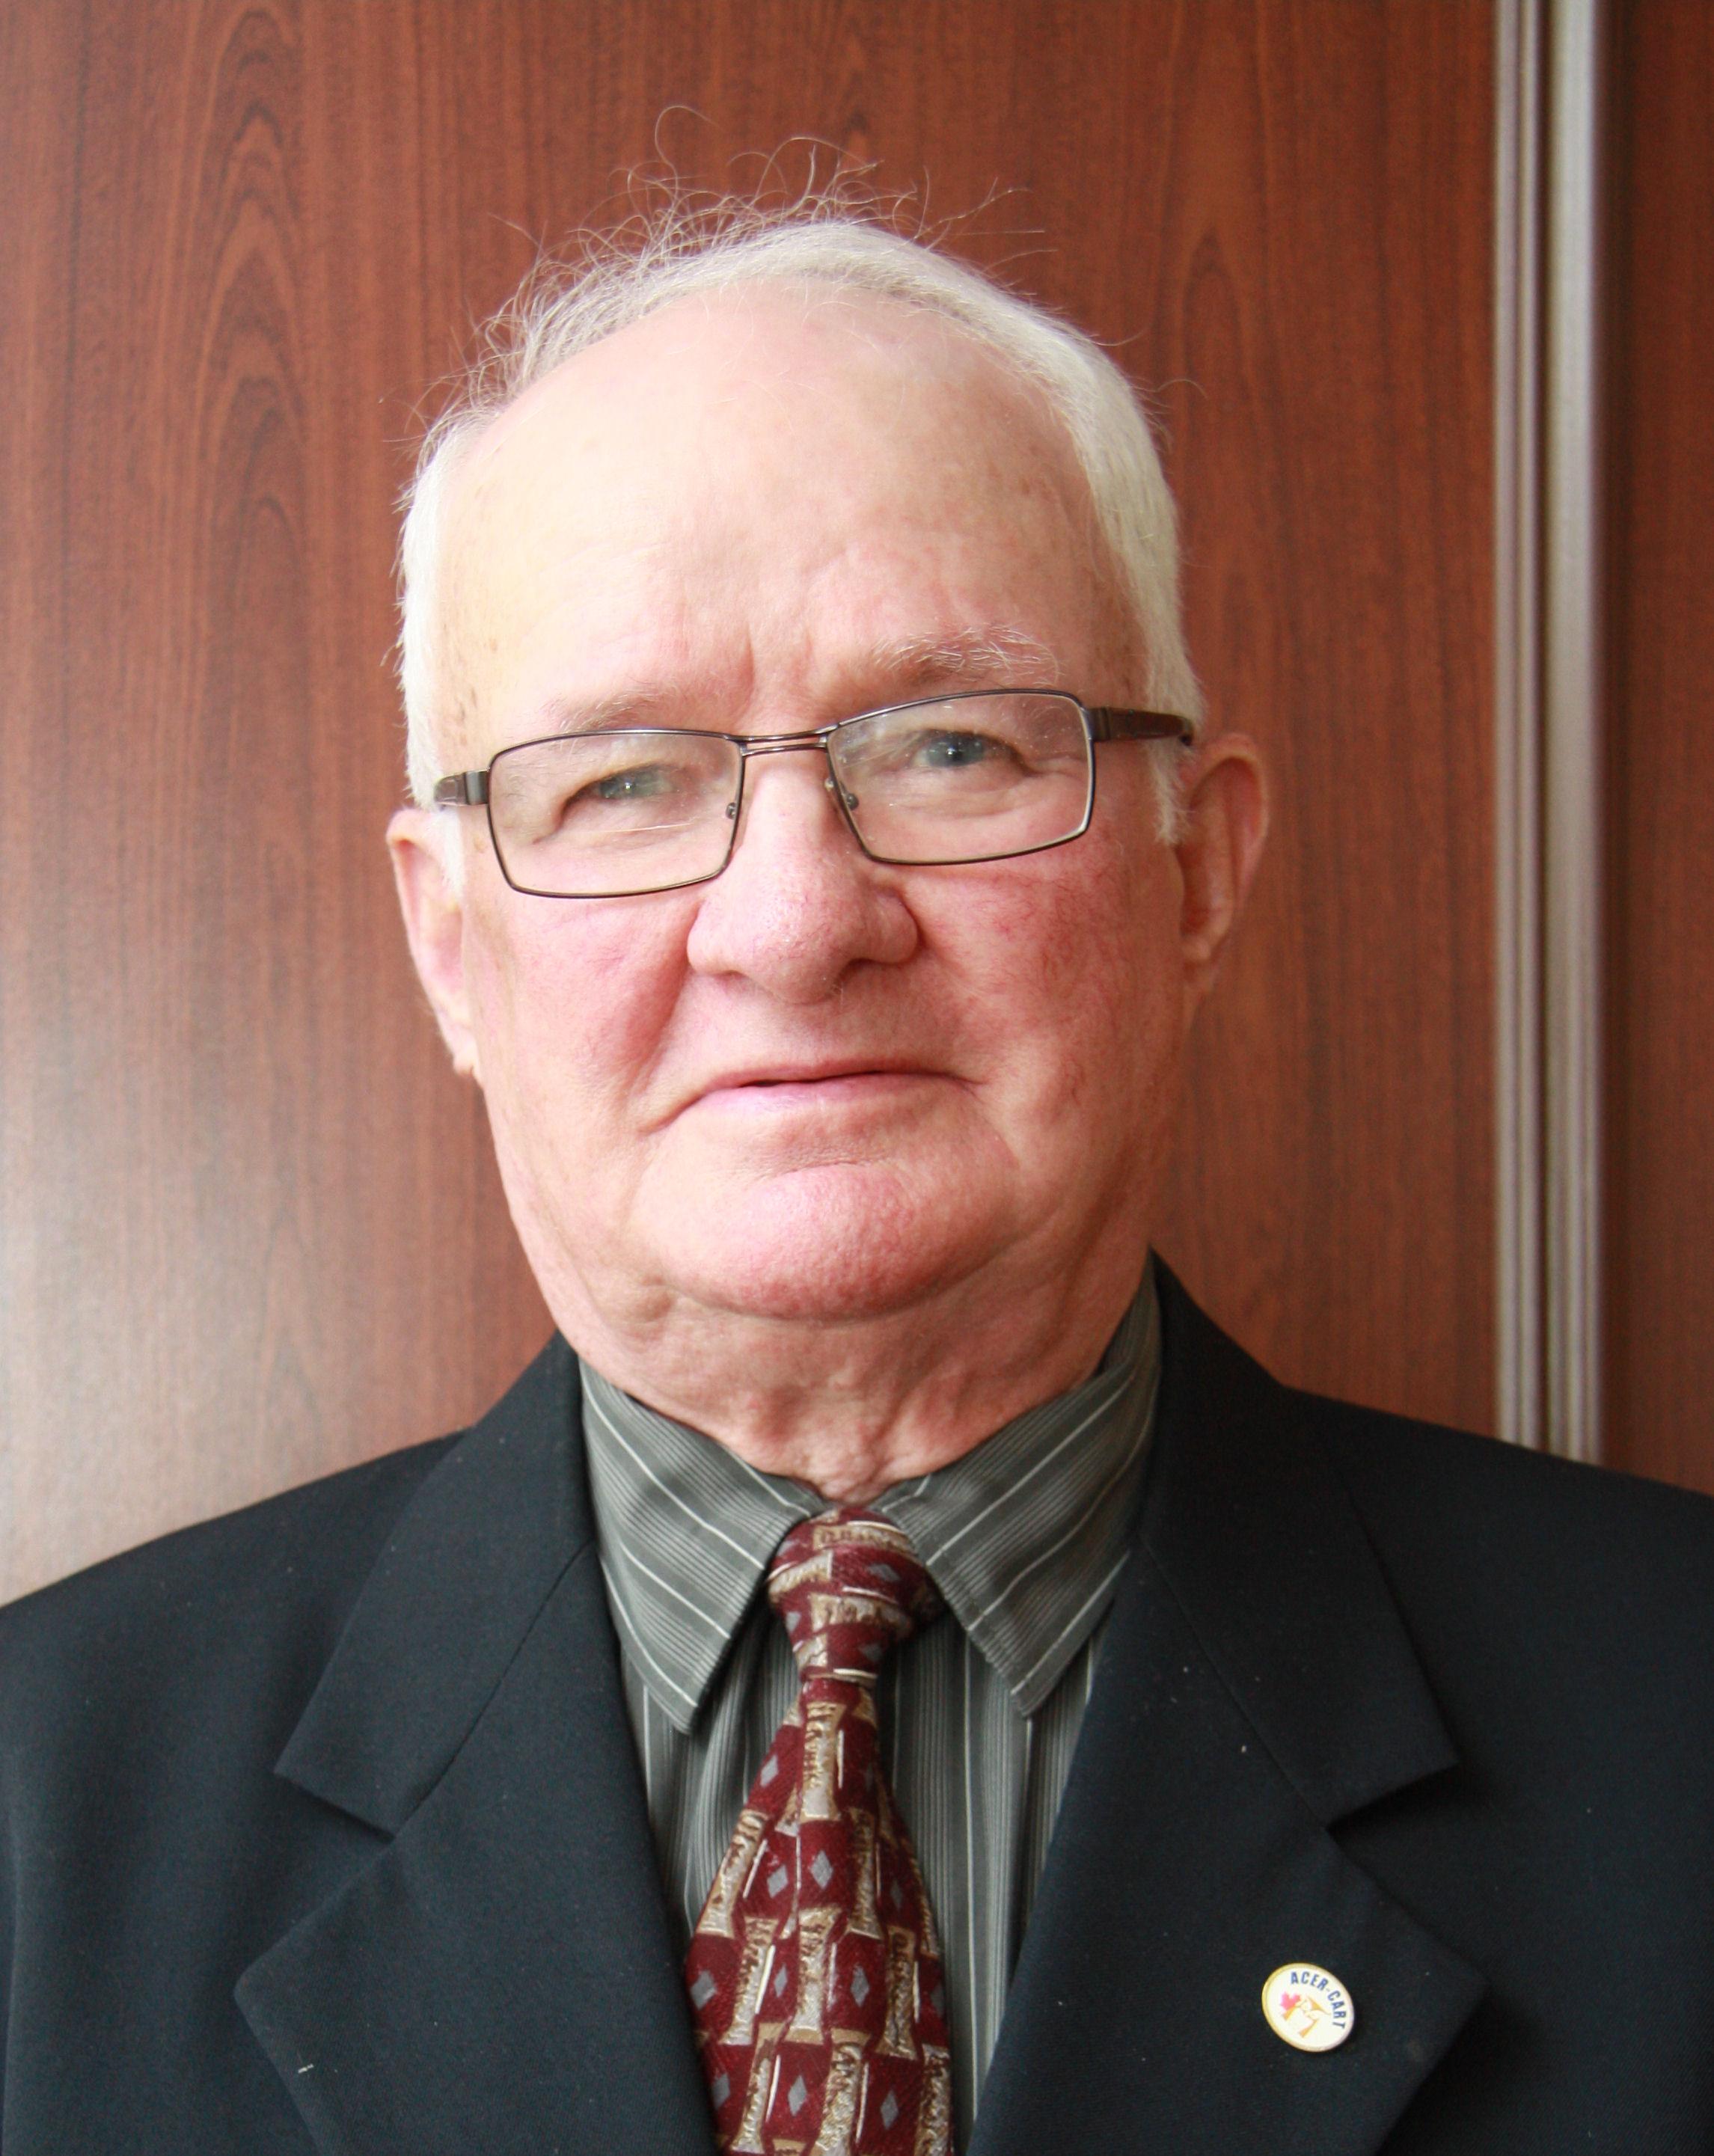 Edward Zegray , Représentant Régional-Est: acer-cart.org/acer-cart-executive